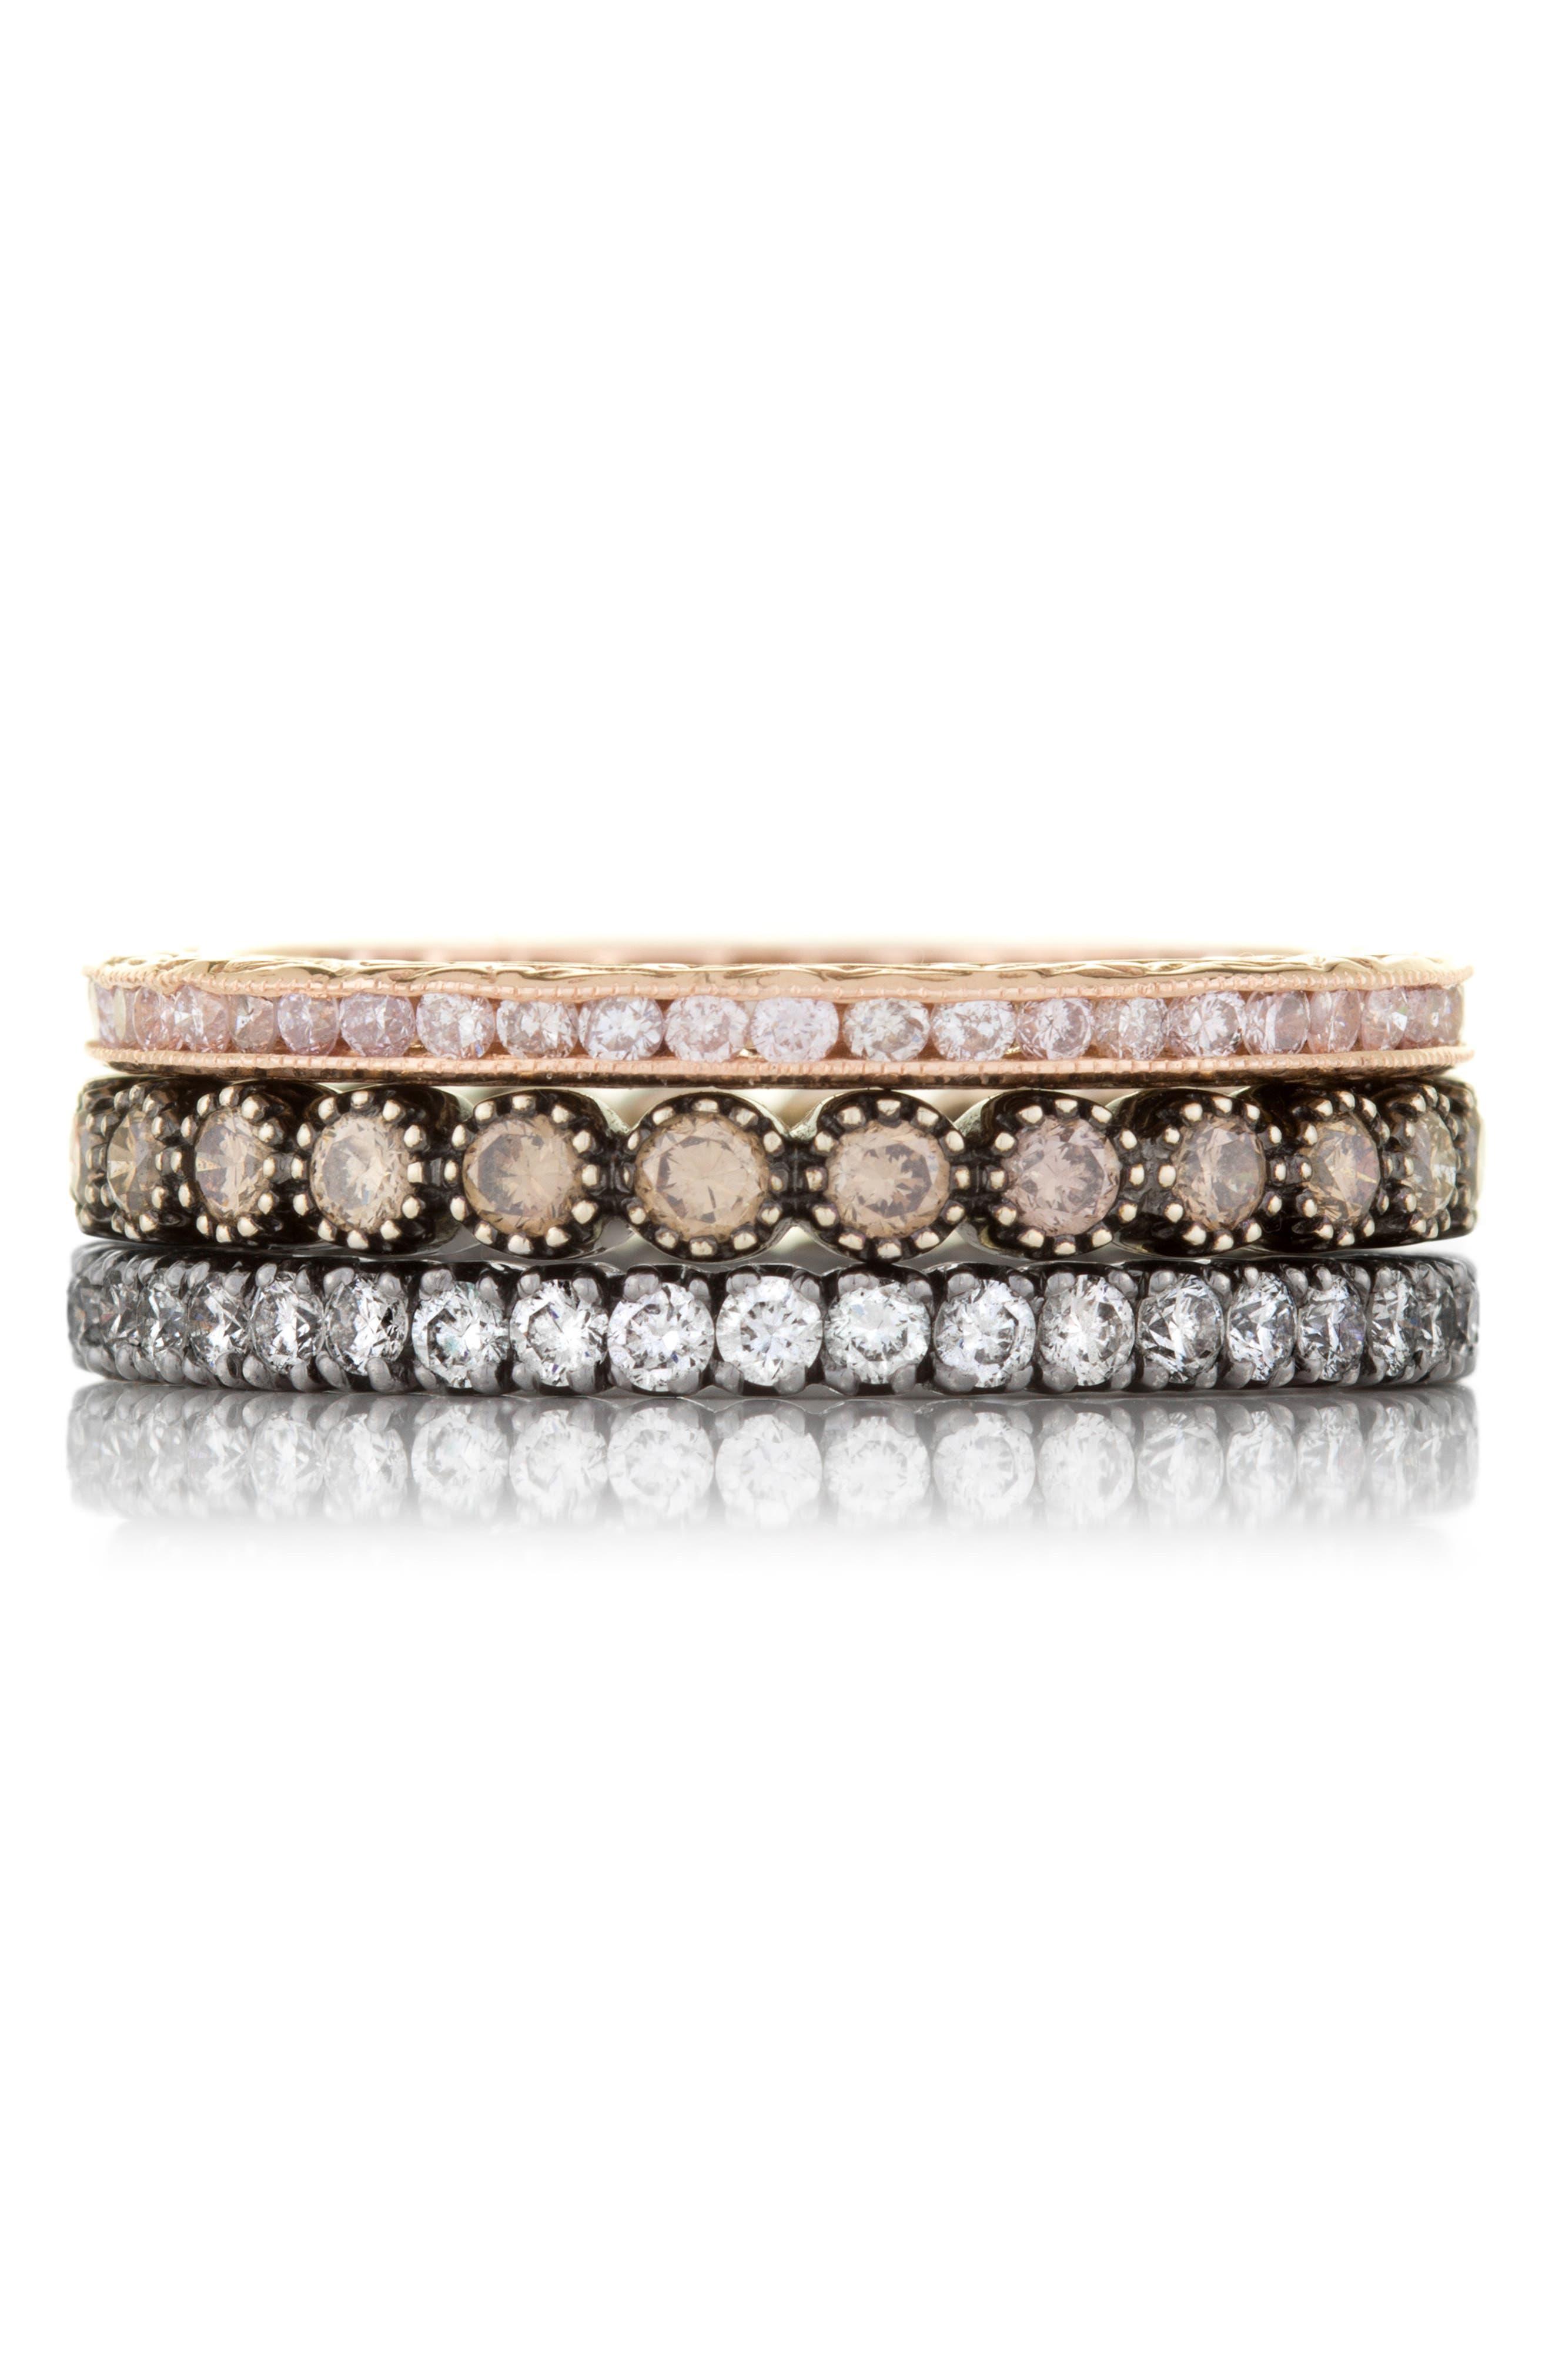 Channel Set Diamond Ring,                             Alternate thumbnail 3, color,                             ROSE GOLD